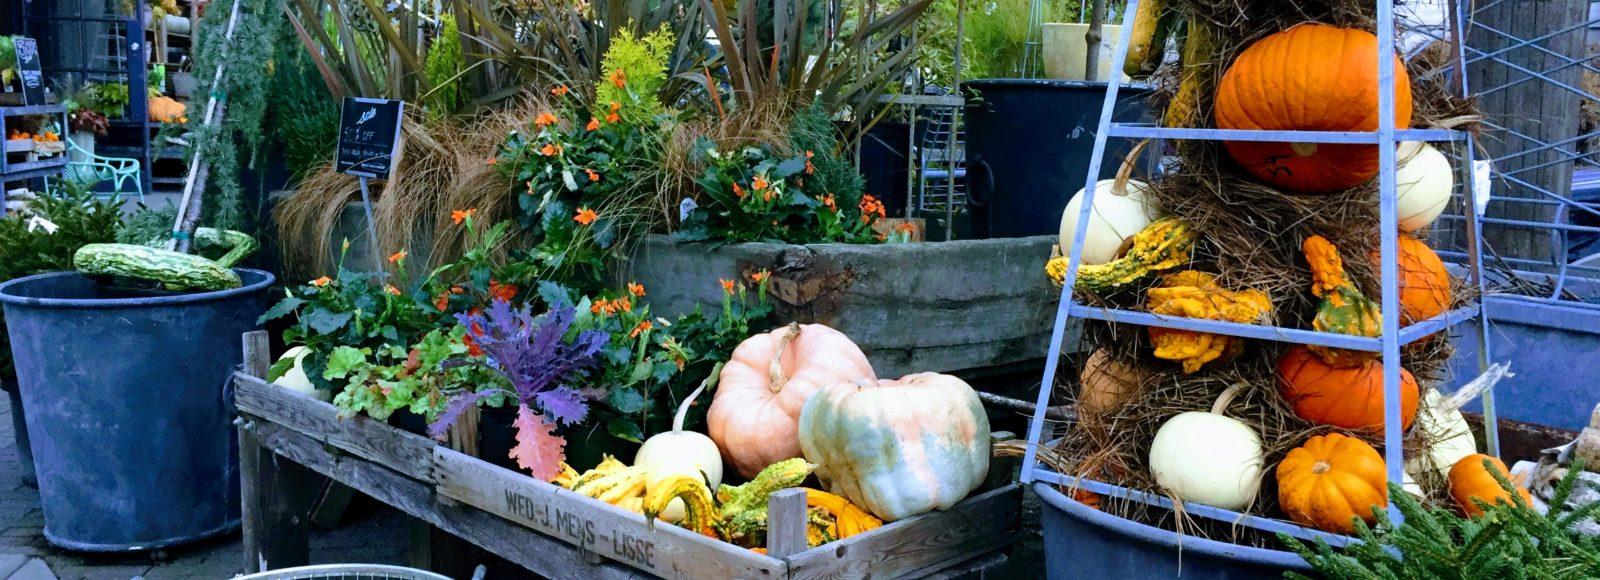 Four Seasons of Home & Garden Decor at Terrain in Westport | Tami ...